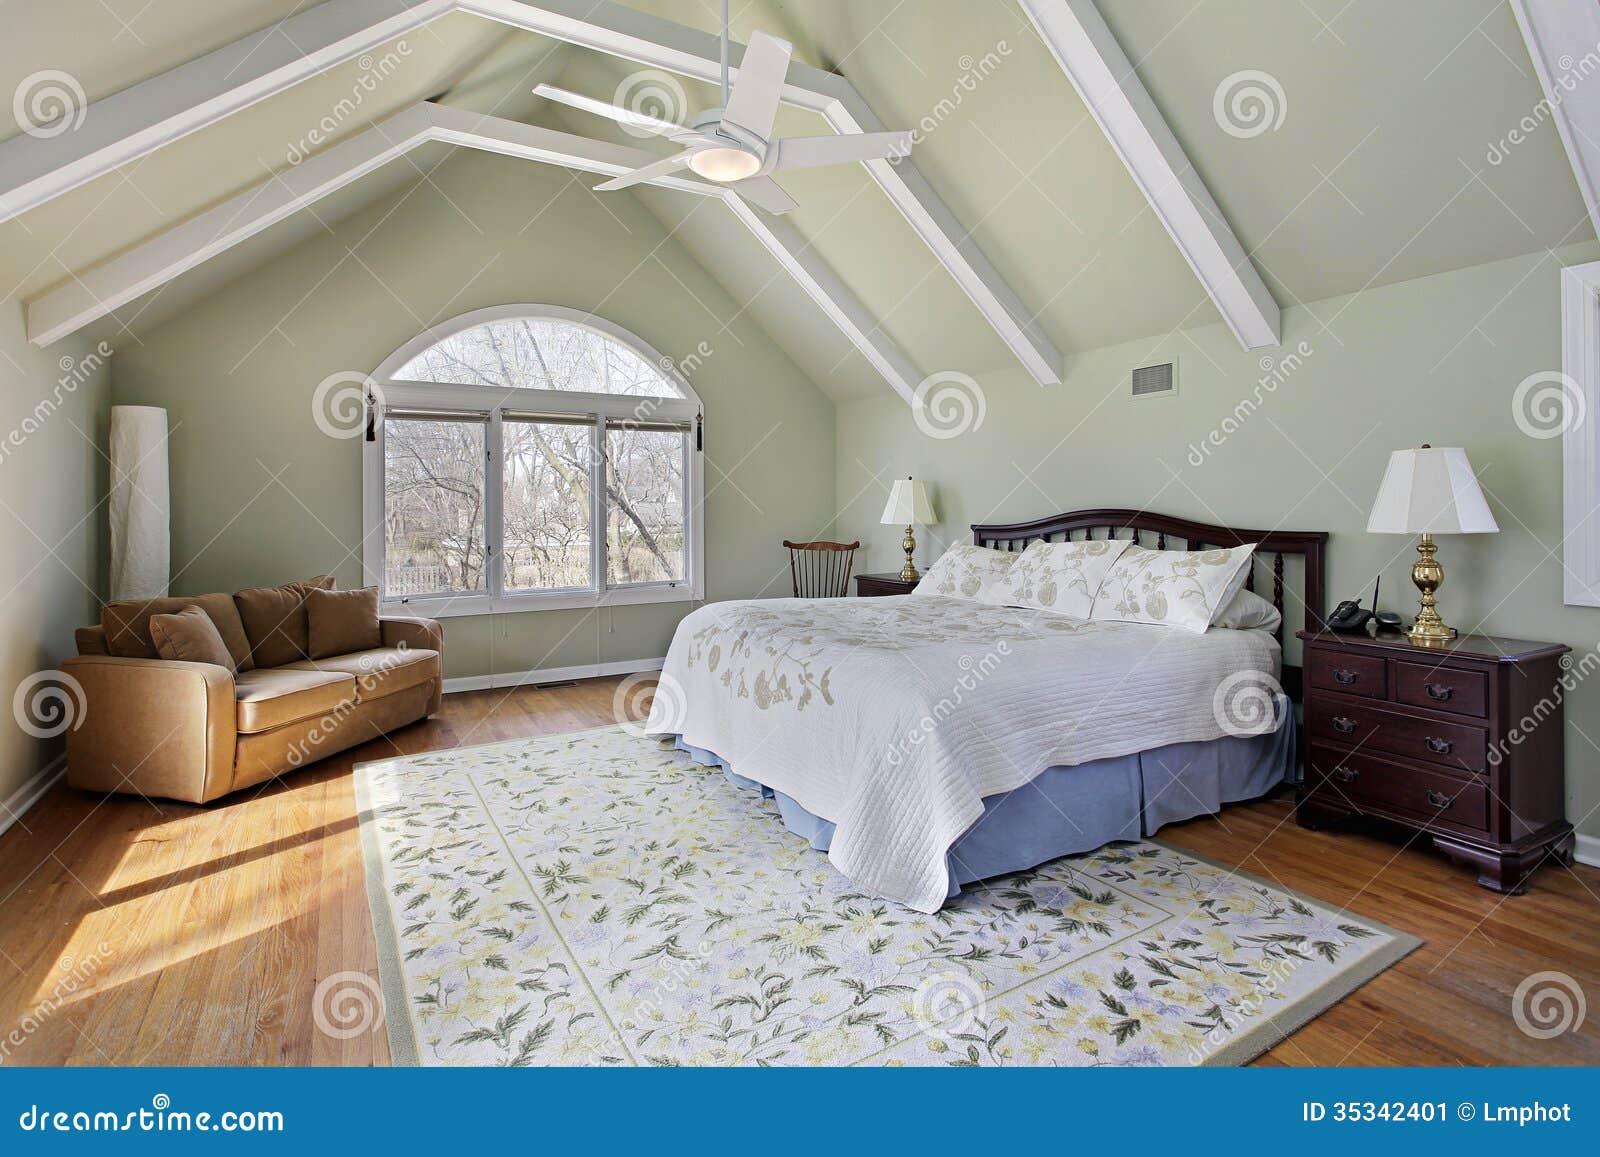 Plafond chambre coucher int rieur meubles - Plafond chambre ...